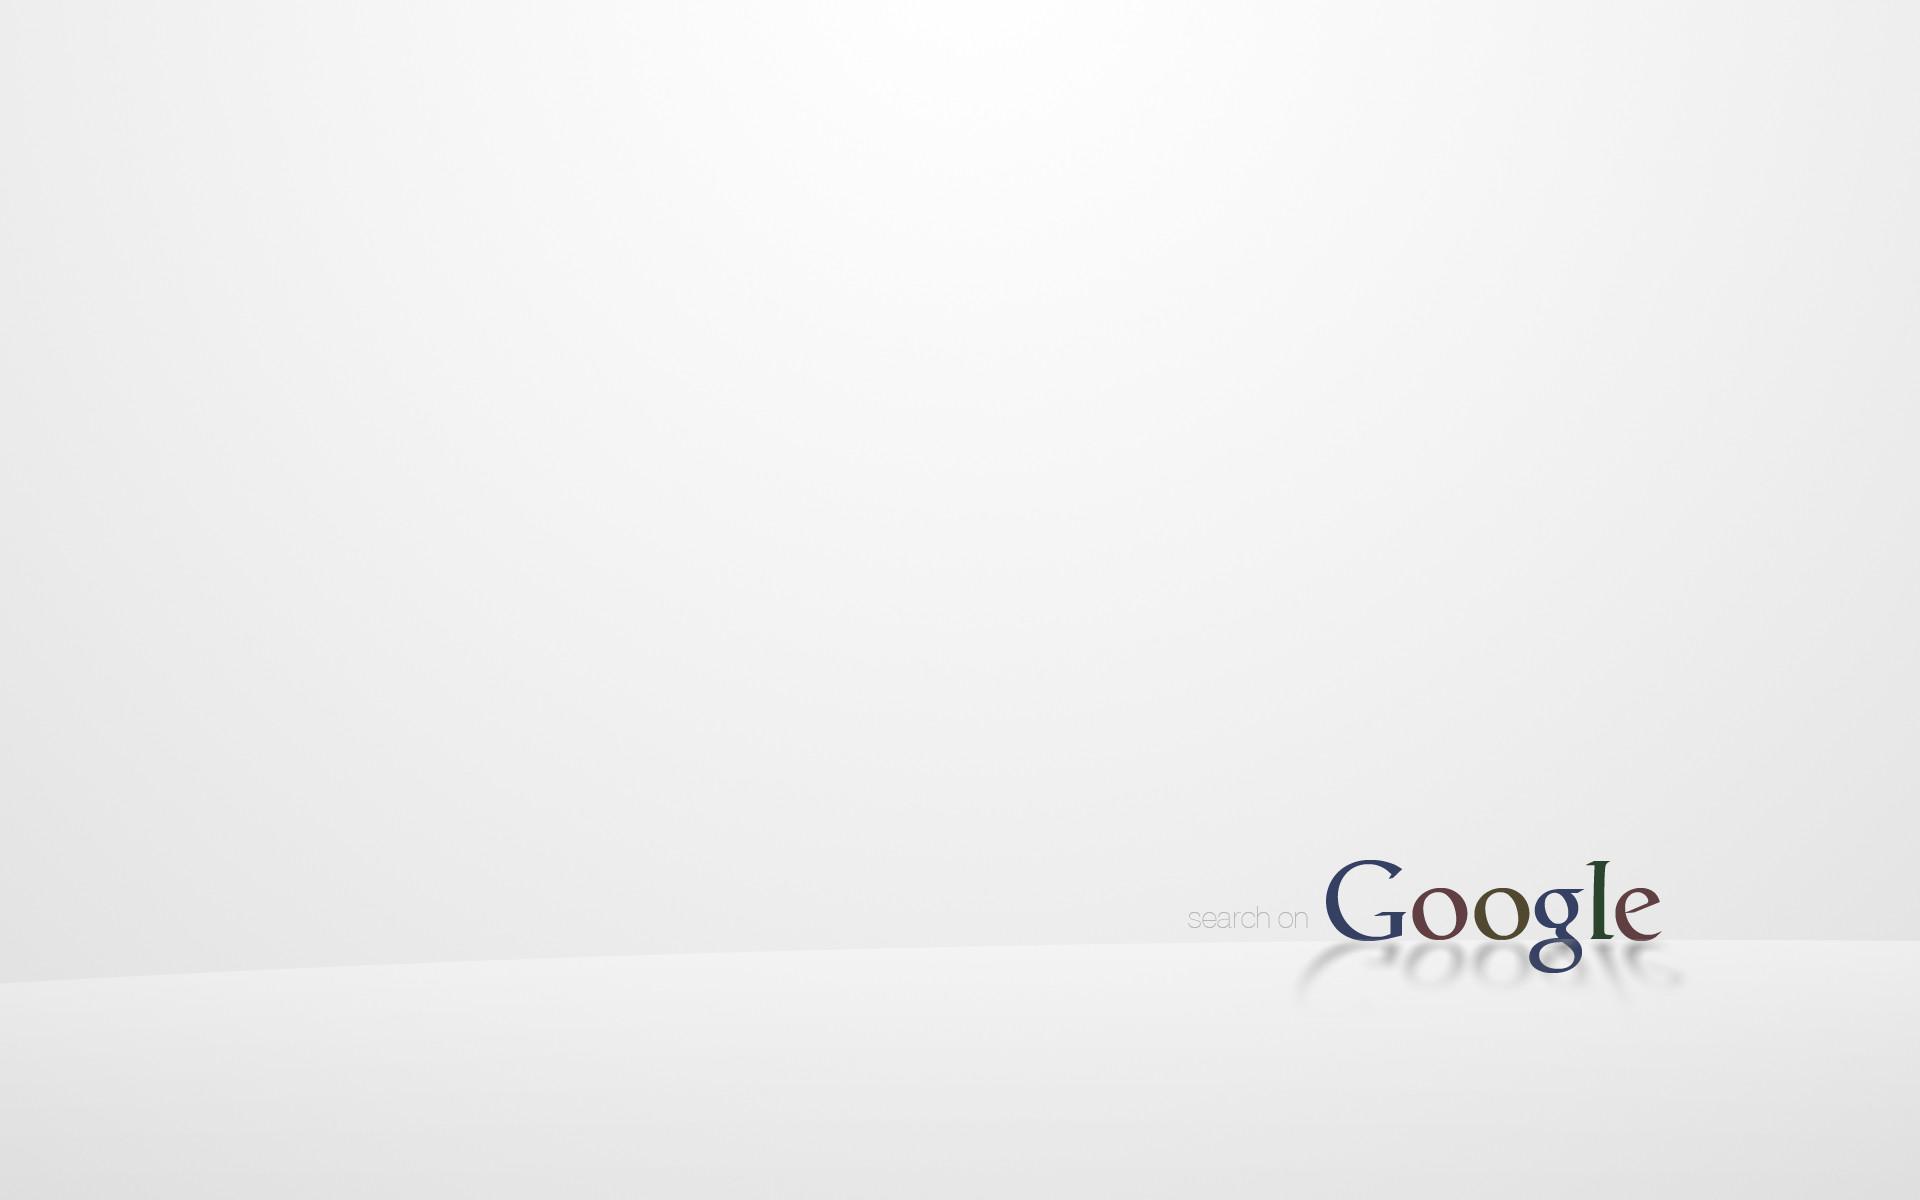 1920x1080 Collection Google Chrome Desktop Wallpapers Free Wallpaper Full Hd A Long